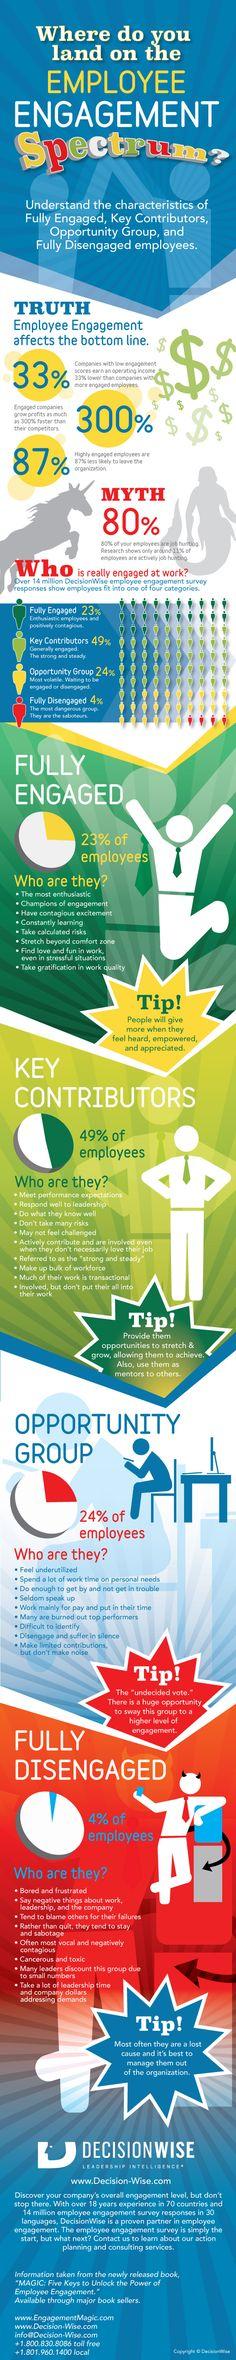 Employee Engagement Spectrum Infographic